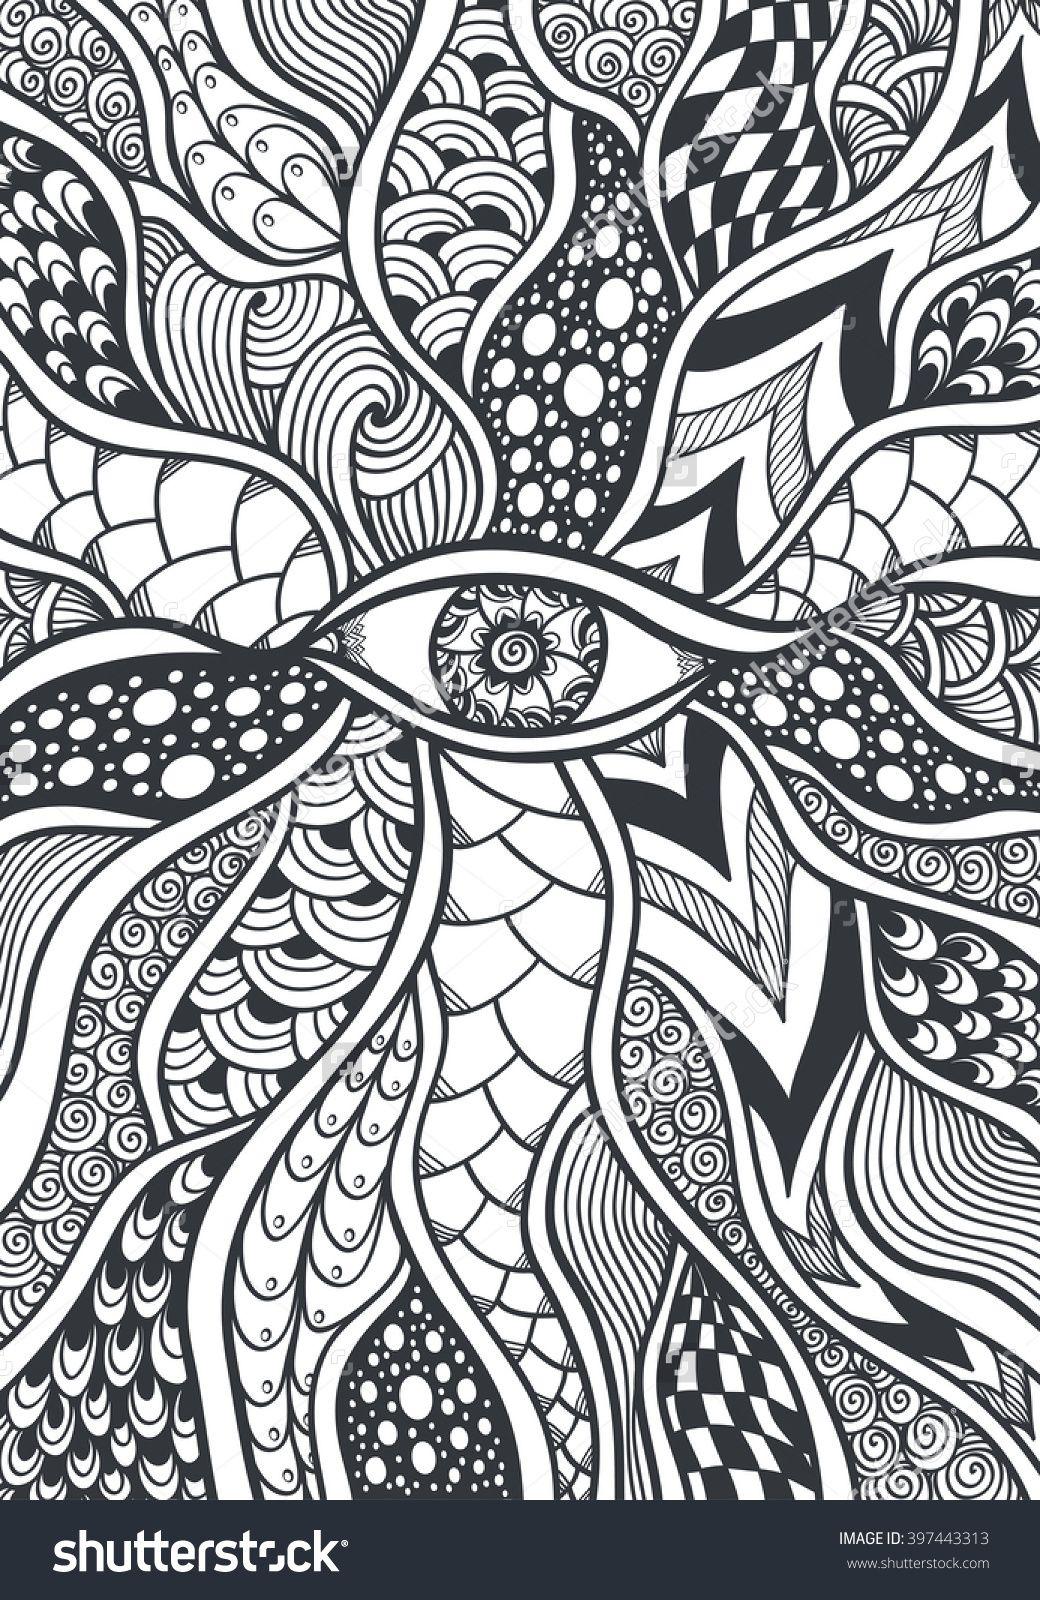 Zen Doodle Eye Coloring Page 397443313 Shutterstock Doodle